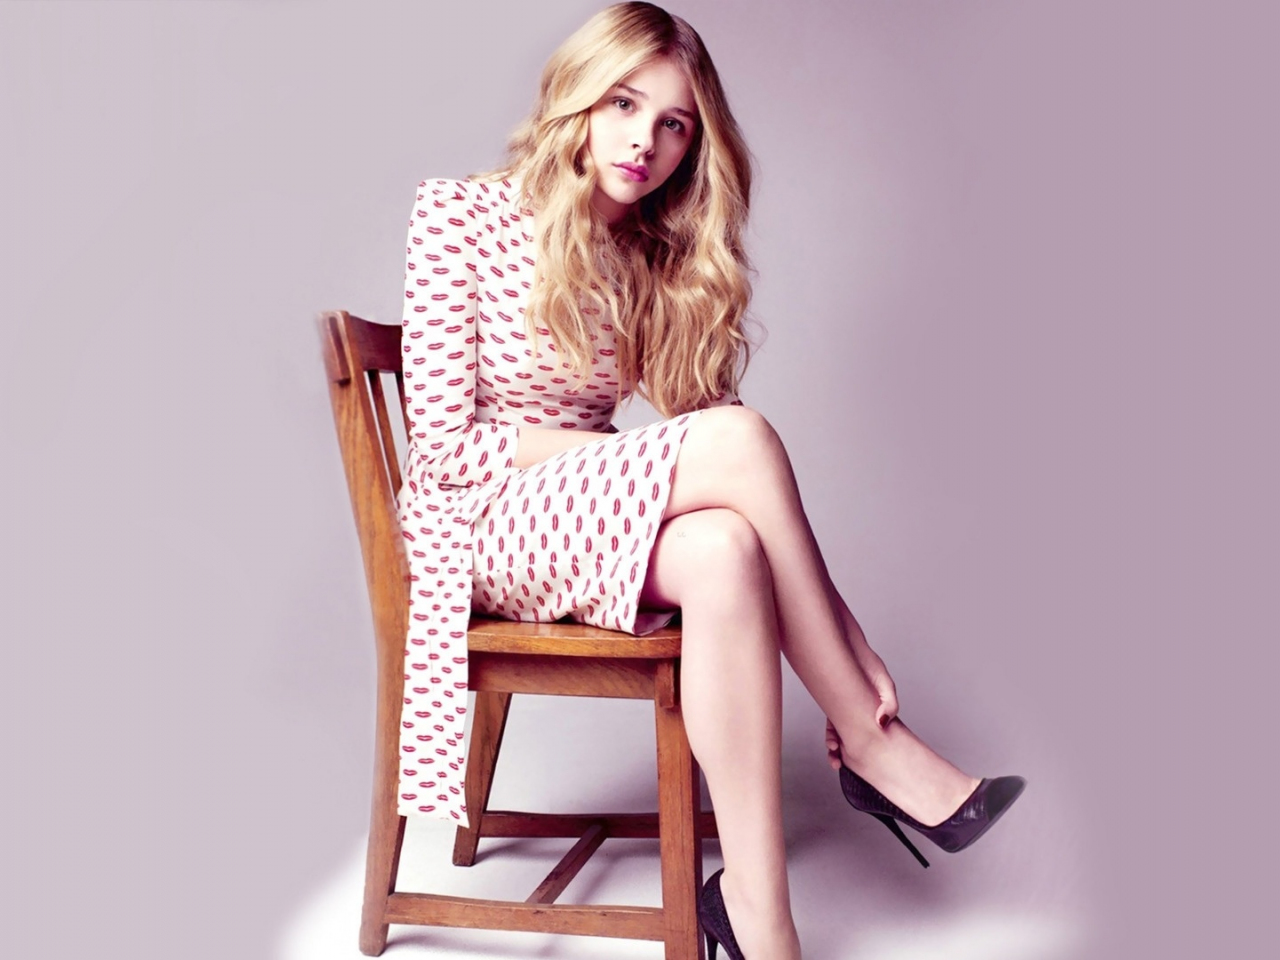 Chloe Grace Moretz, sit, celebrity, 1280x960 wallpaper